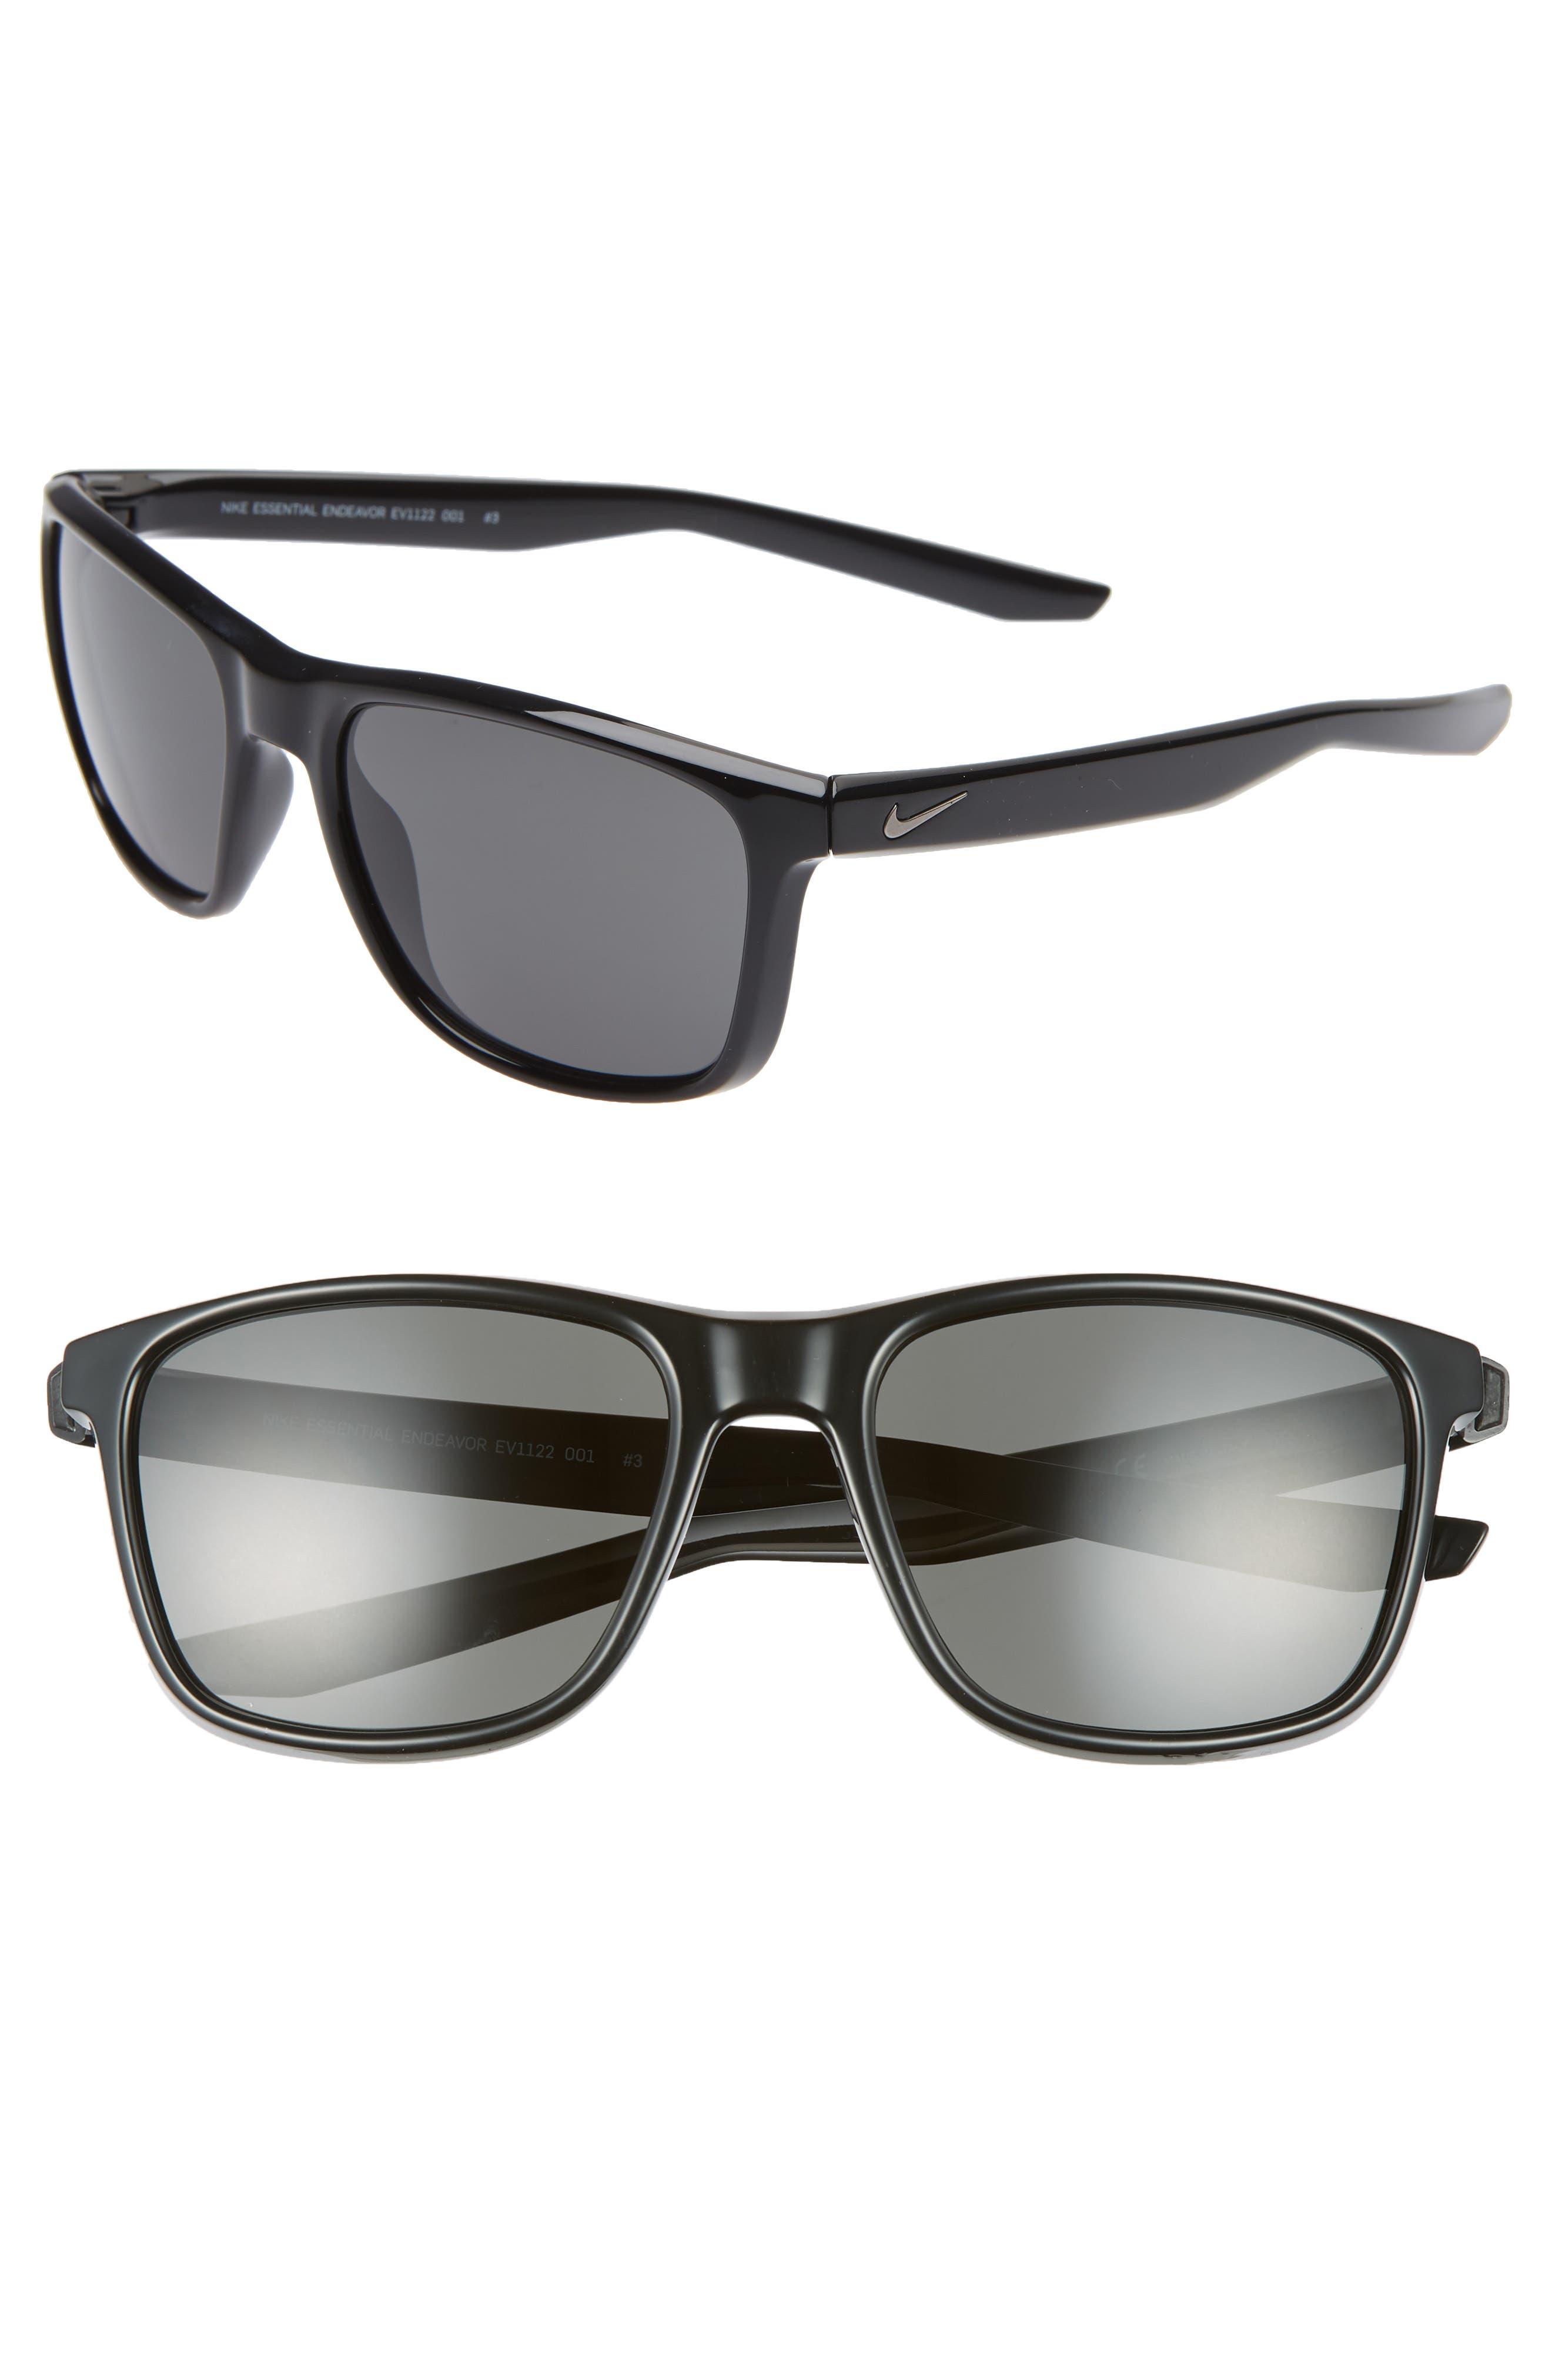 Nike Essential Endeavor 57Mm Square Sunglasses - Black/ Grey